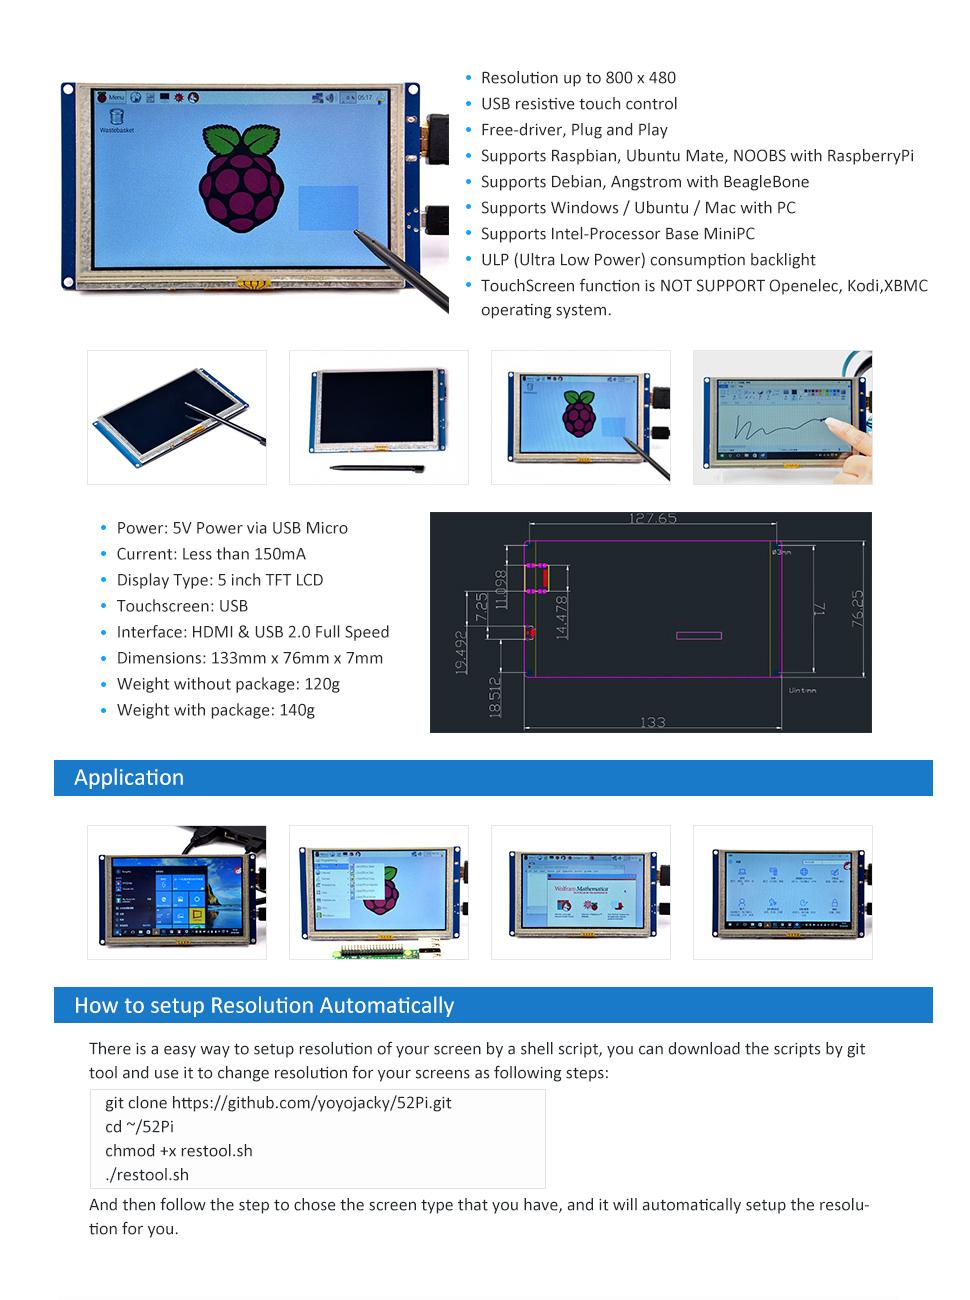 GeeekPi 5 inch HDMI Monitor LCD Resistive Touch Screen 800x480 LCD Display  USB Interface for Raspberry Pi 3/2 Model B/B+ & Banana Pi (Plug and Play